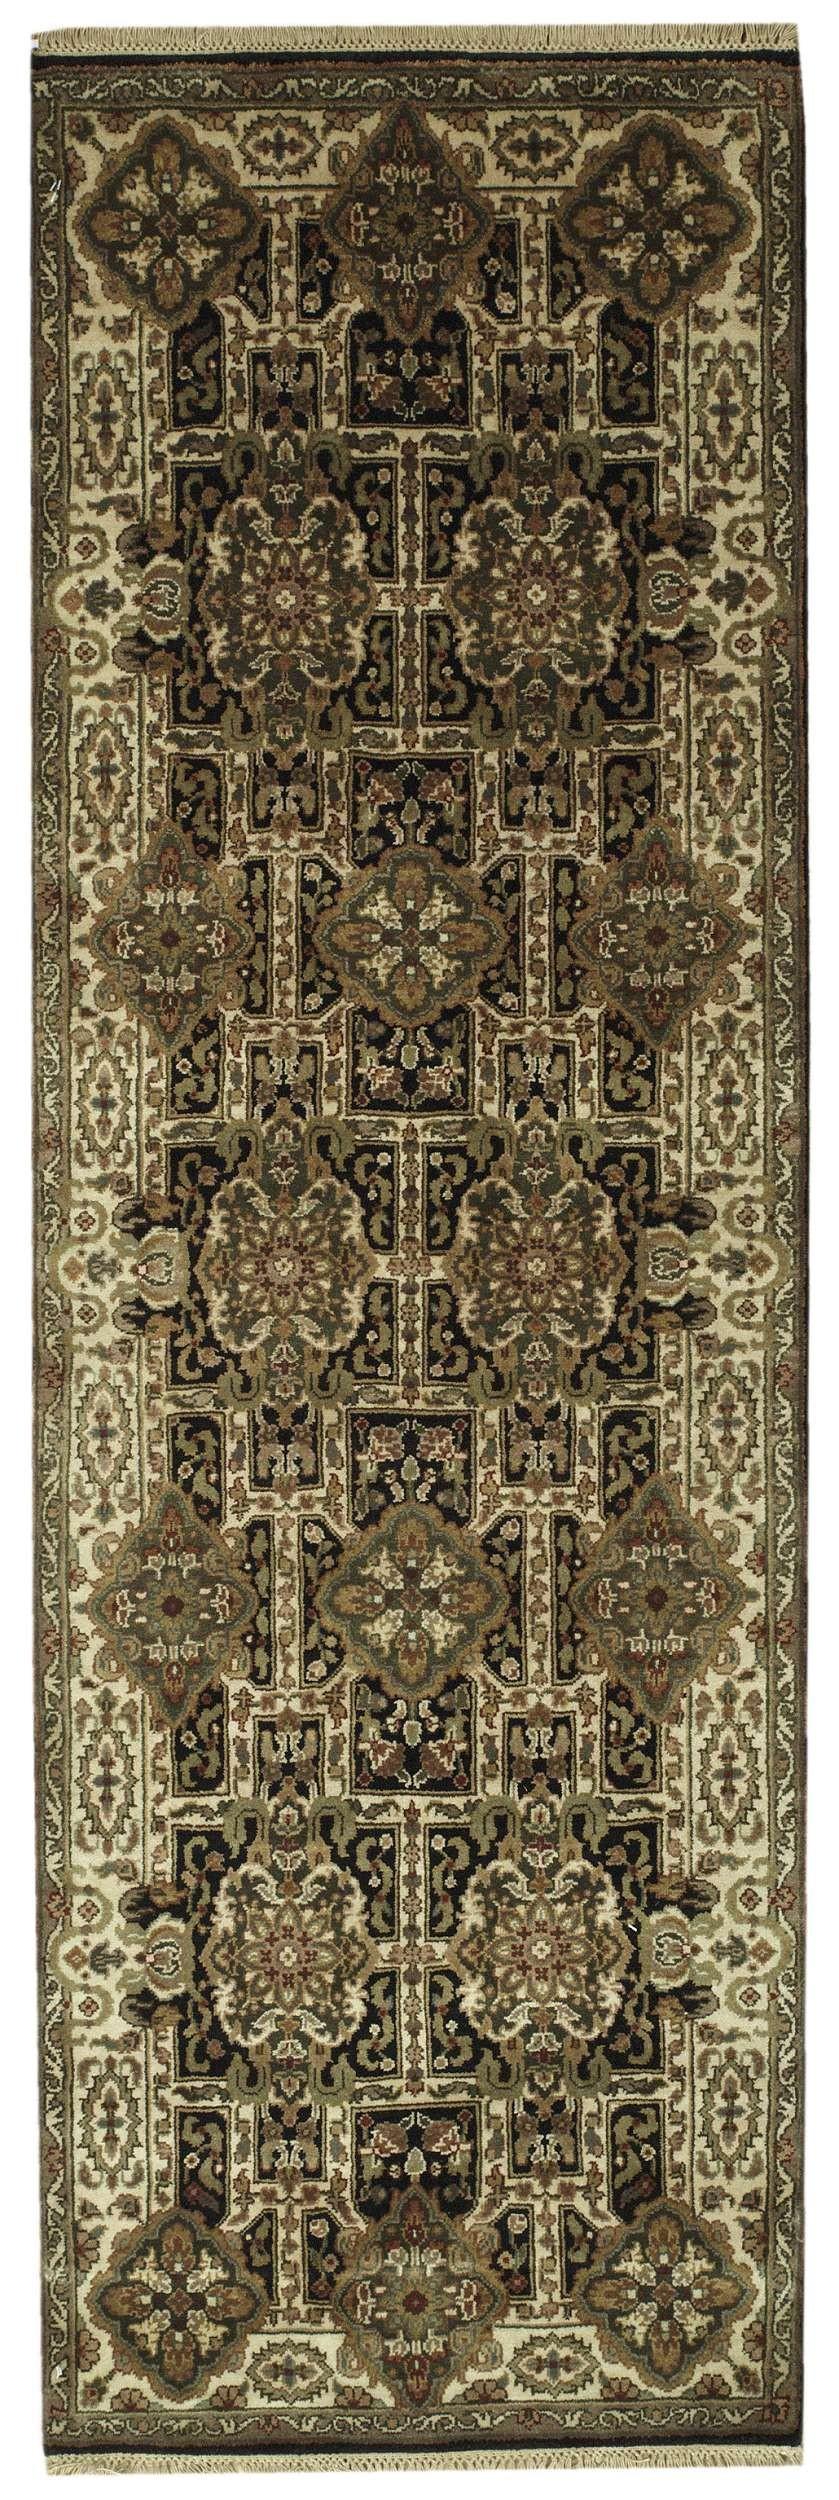 New Contemporary Persian Bakhtiari Area Rug 57995 -